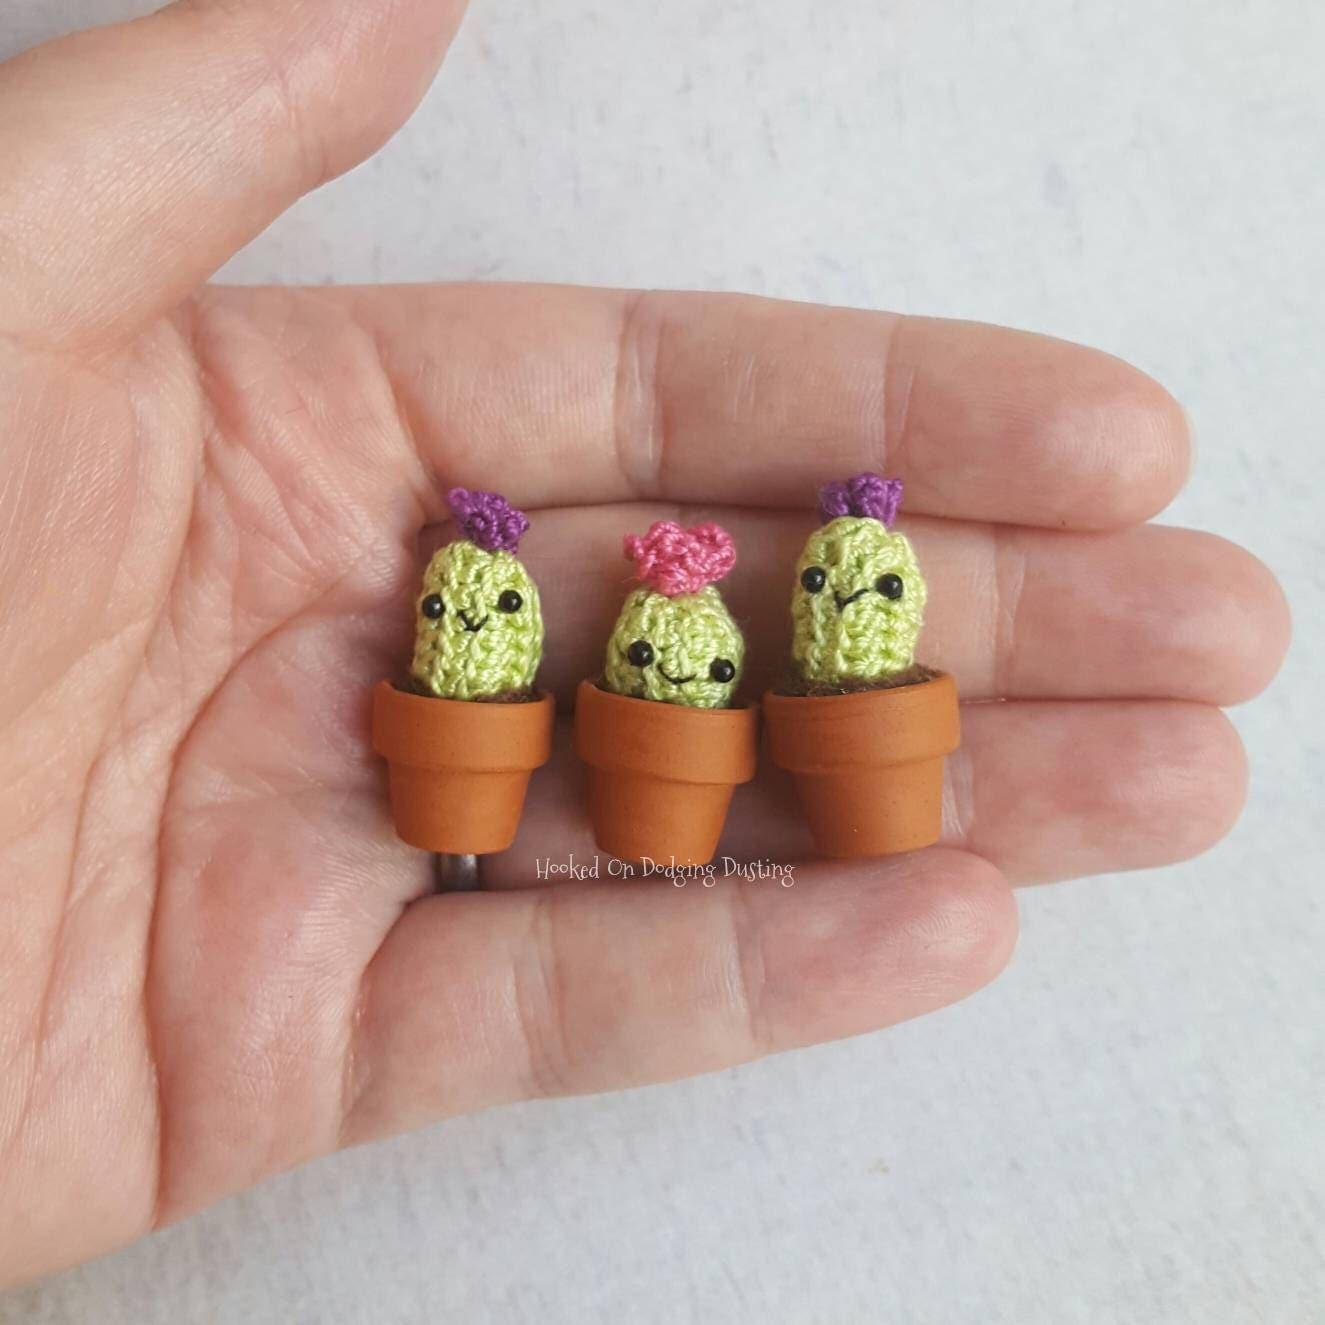 Miniature mini cactus succulent cacti flower plant garden gardener plant pot tiny.